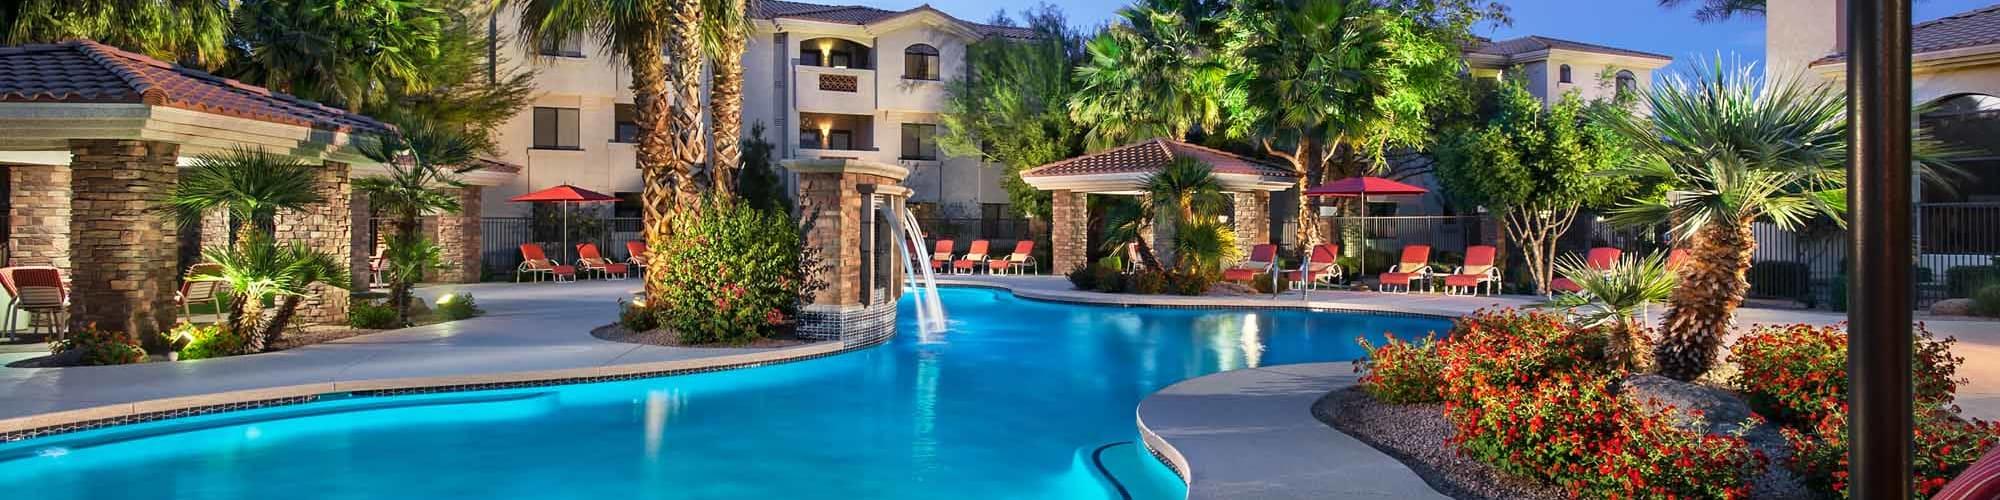 Virtual tour of San Hacienda in Chandler, Arizona